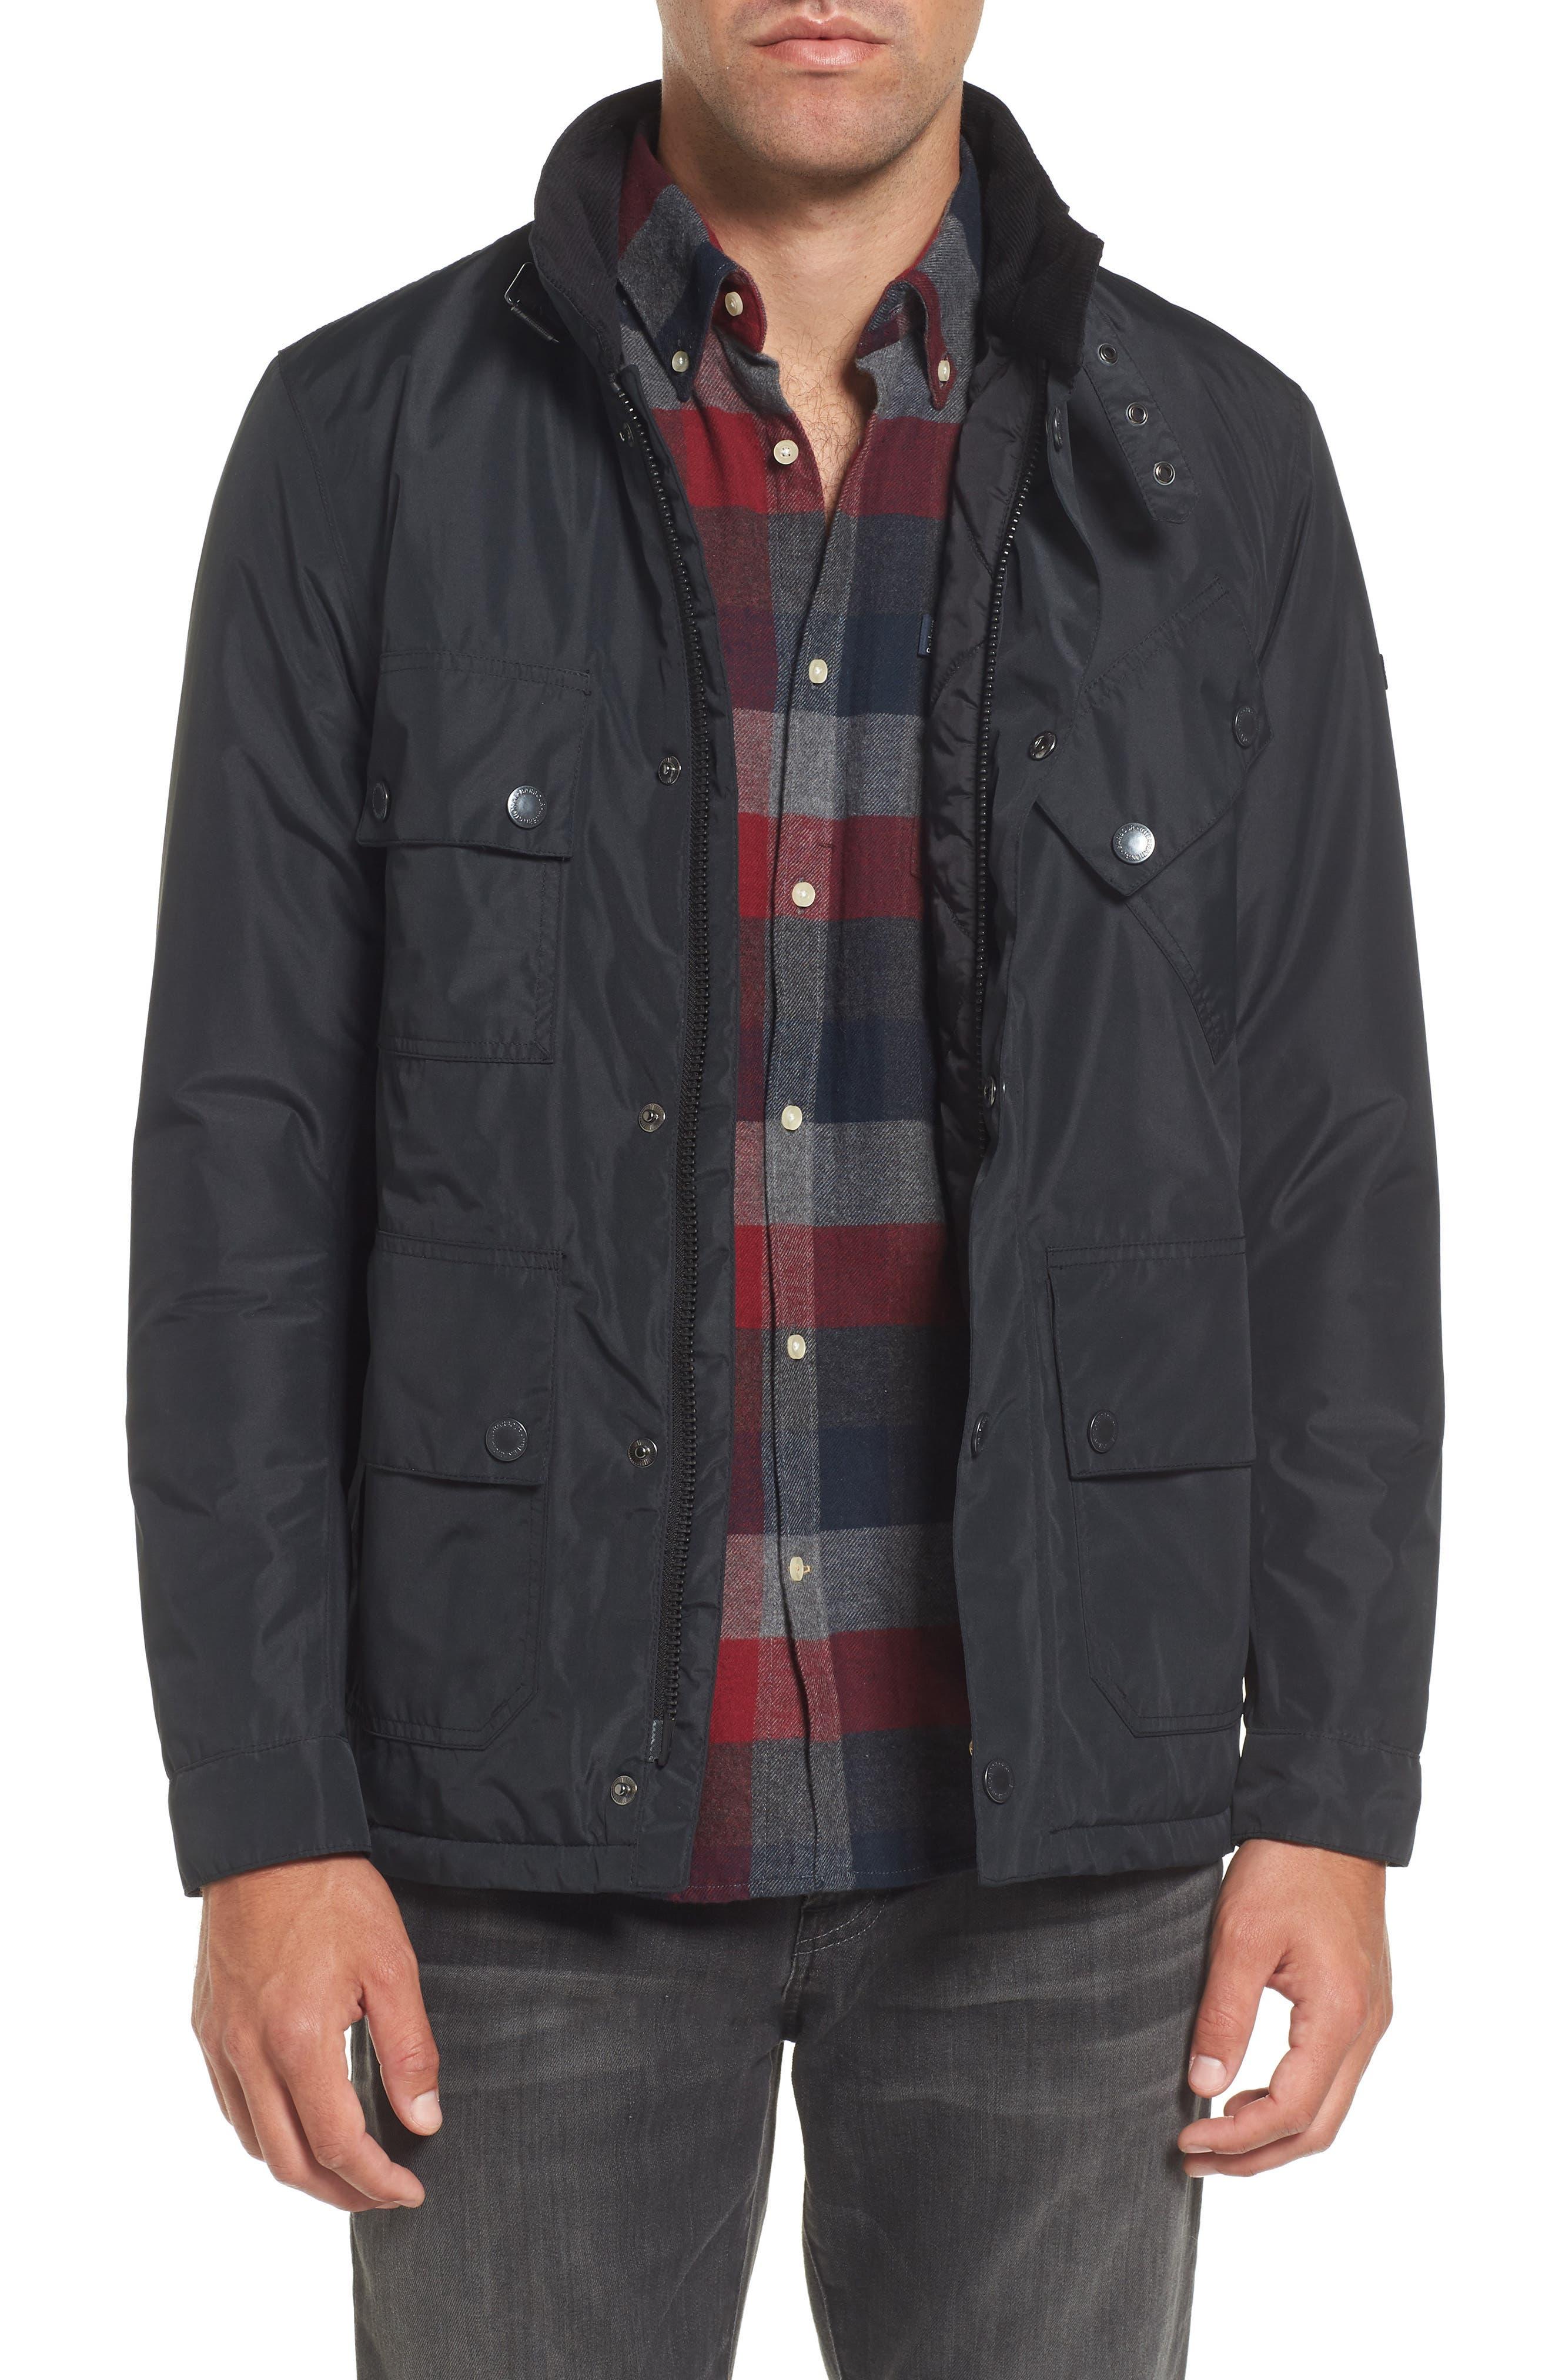 B.Intl Tyne Waterproof Jacket,                             Main thumbnail 1, color,                             Black